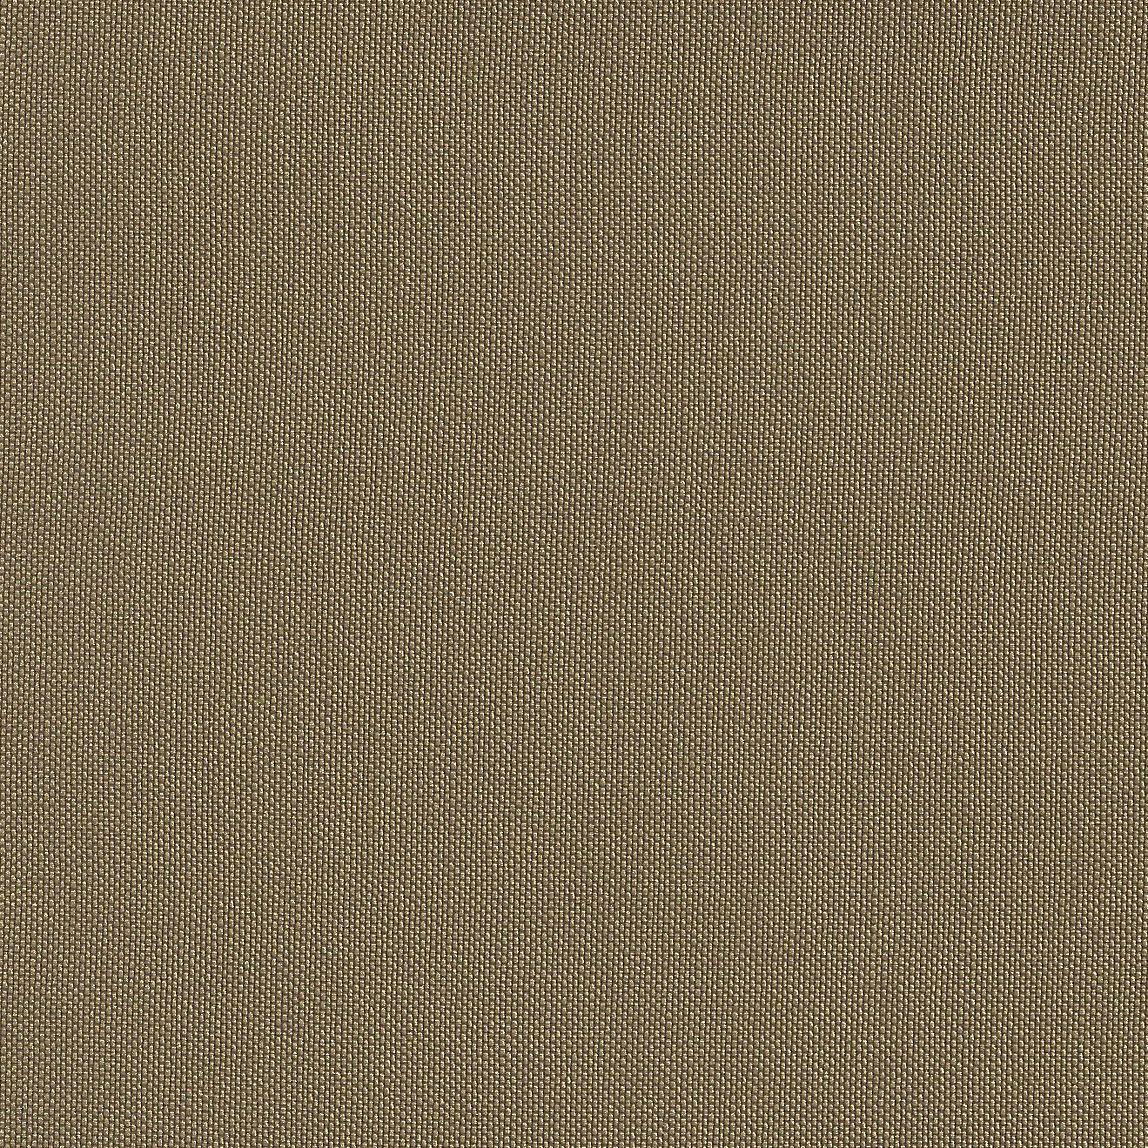 Silvertex Vinyl Marsh Swatch